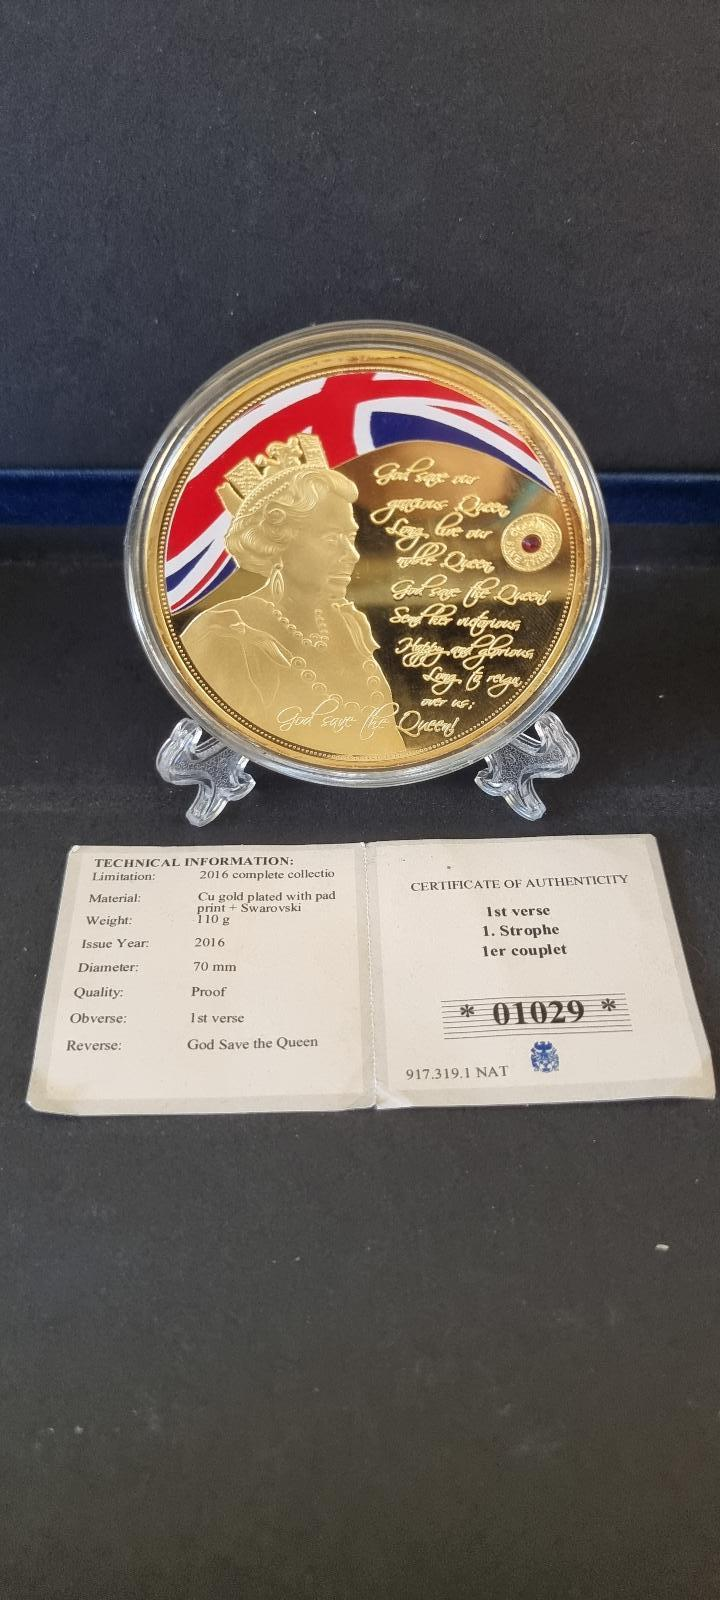 Kralovna Elizabeth ii pozlaceny medailon s narodni hymnou a Swarovski  - Numismatika